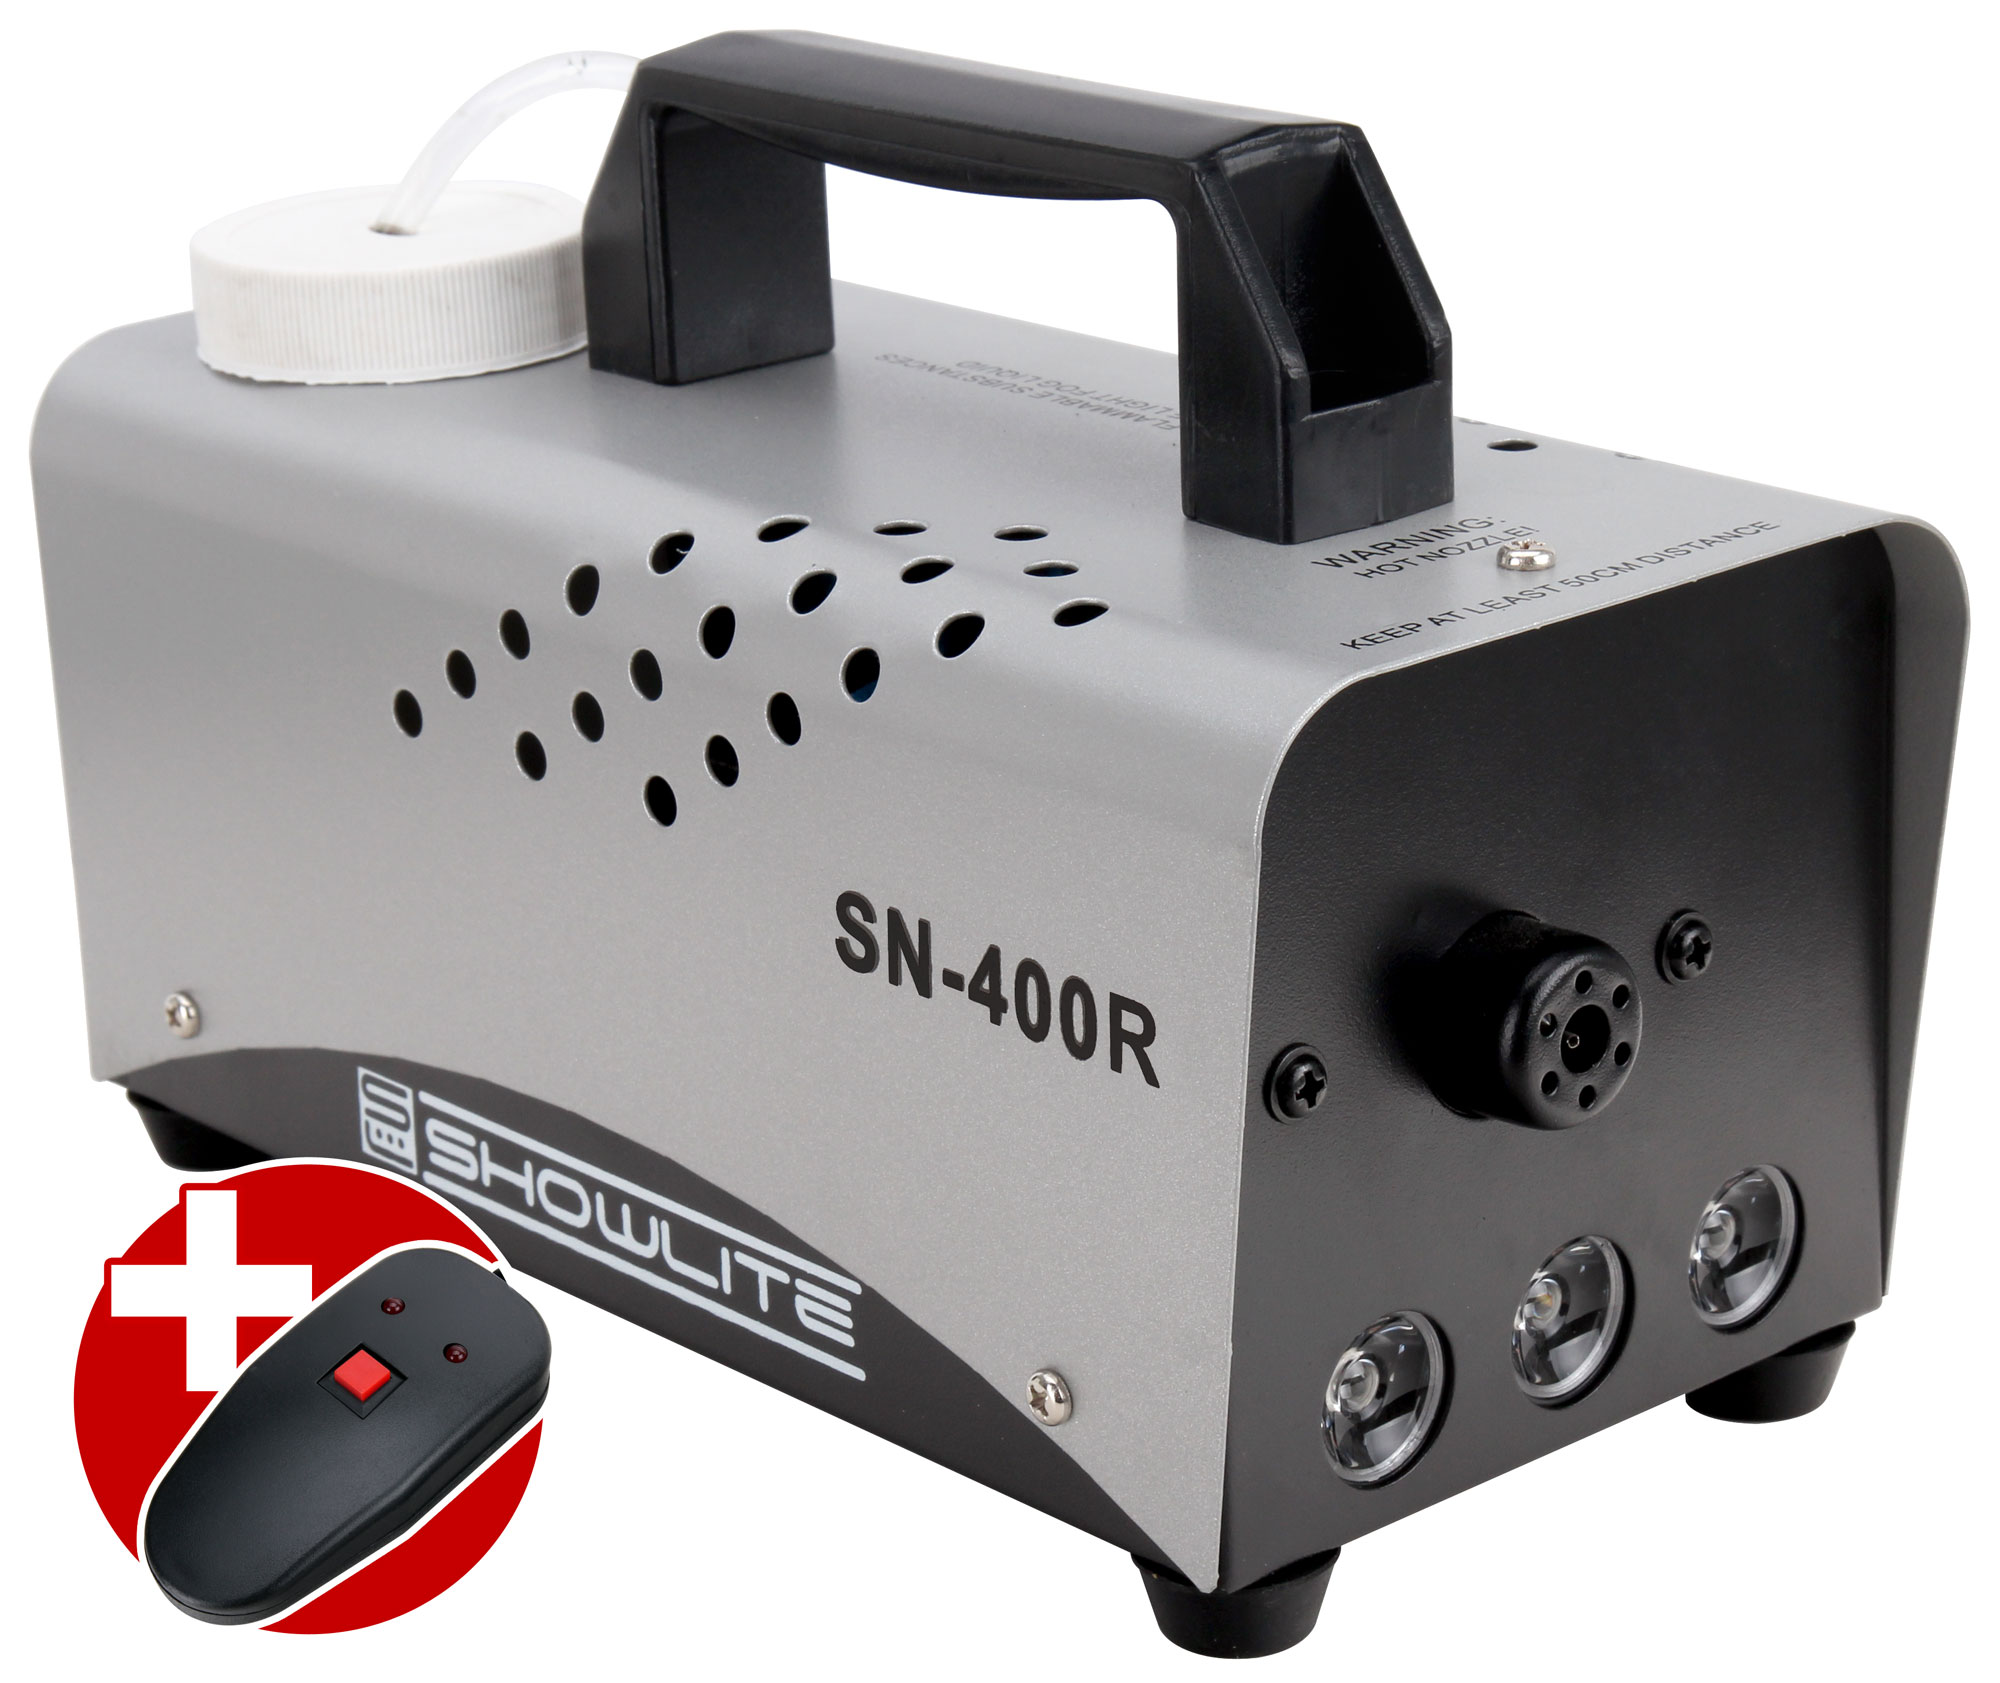 Showlite SN 400R LED Nebelmaschine rot 400W inkl. Fernbedienung